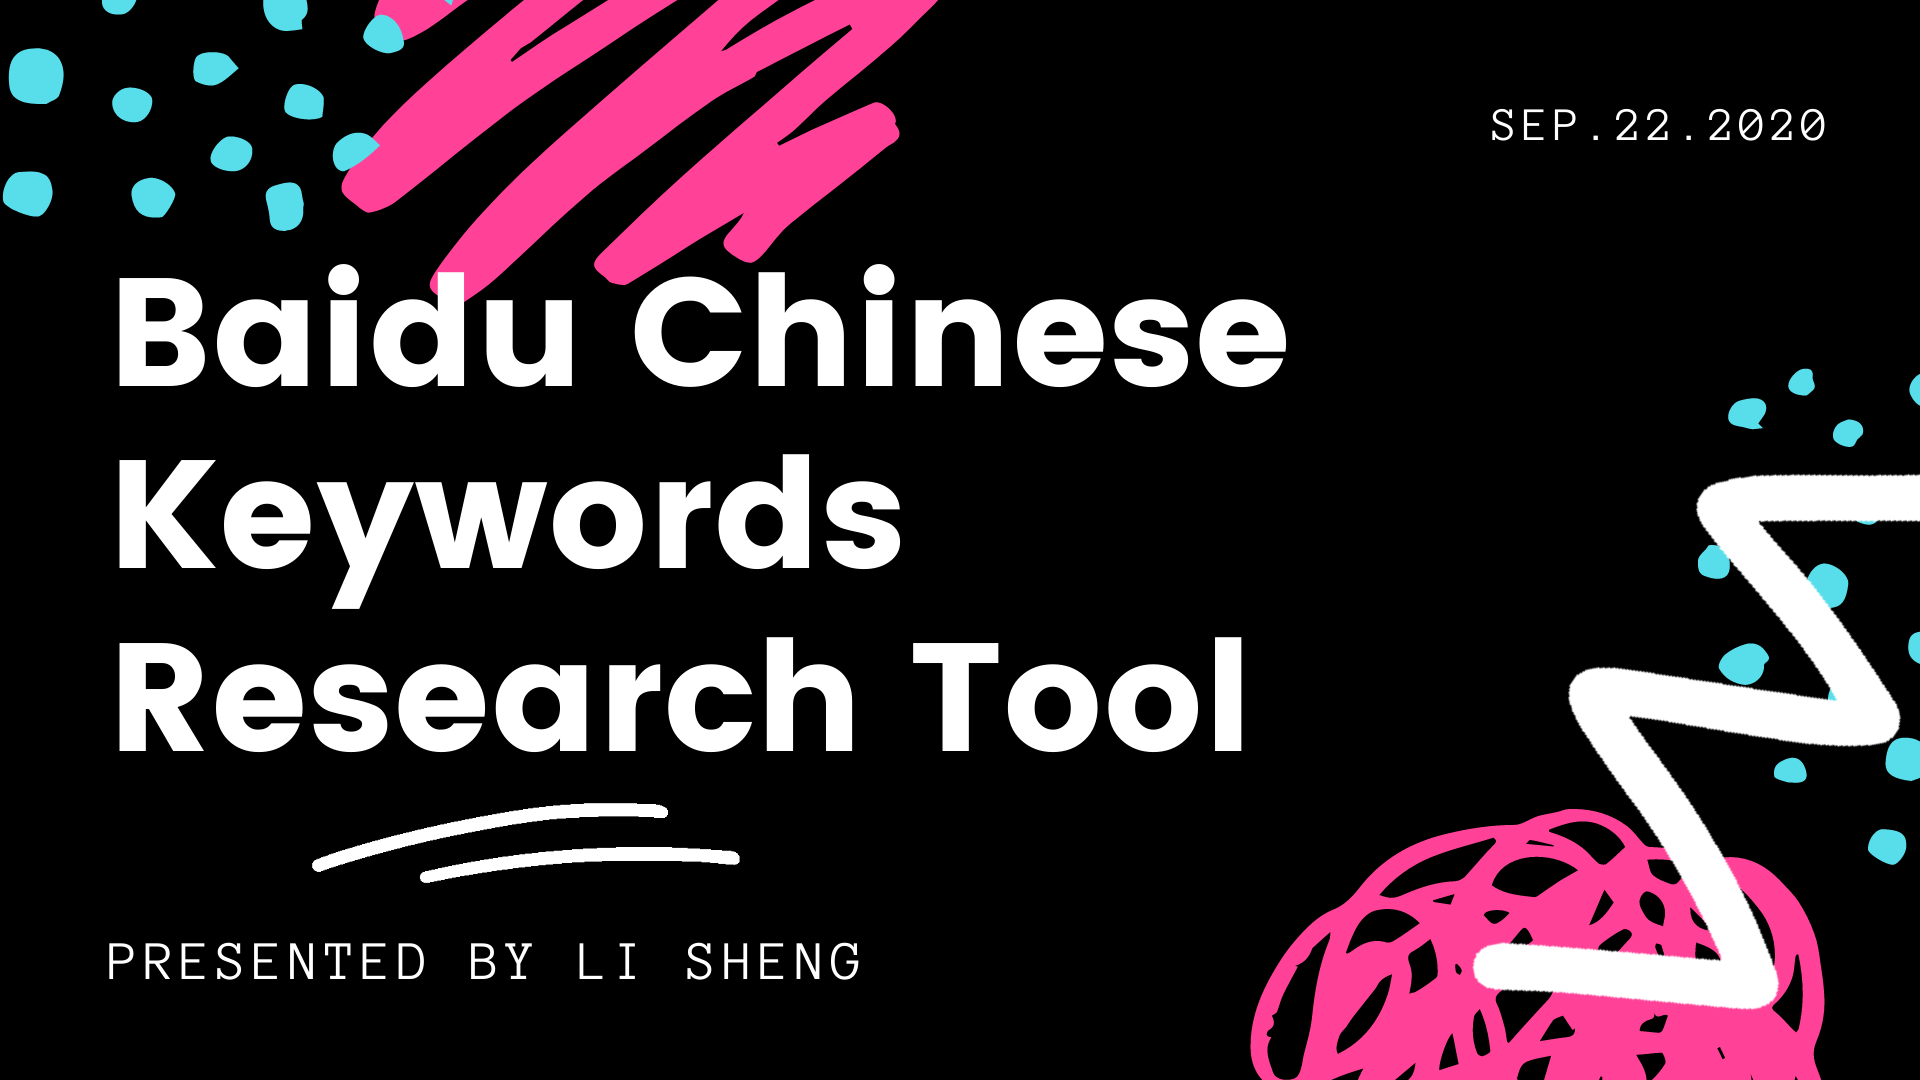 Baidu Chinese Keywords Research Tool